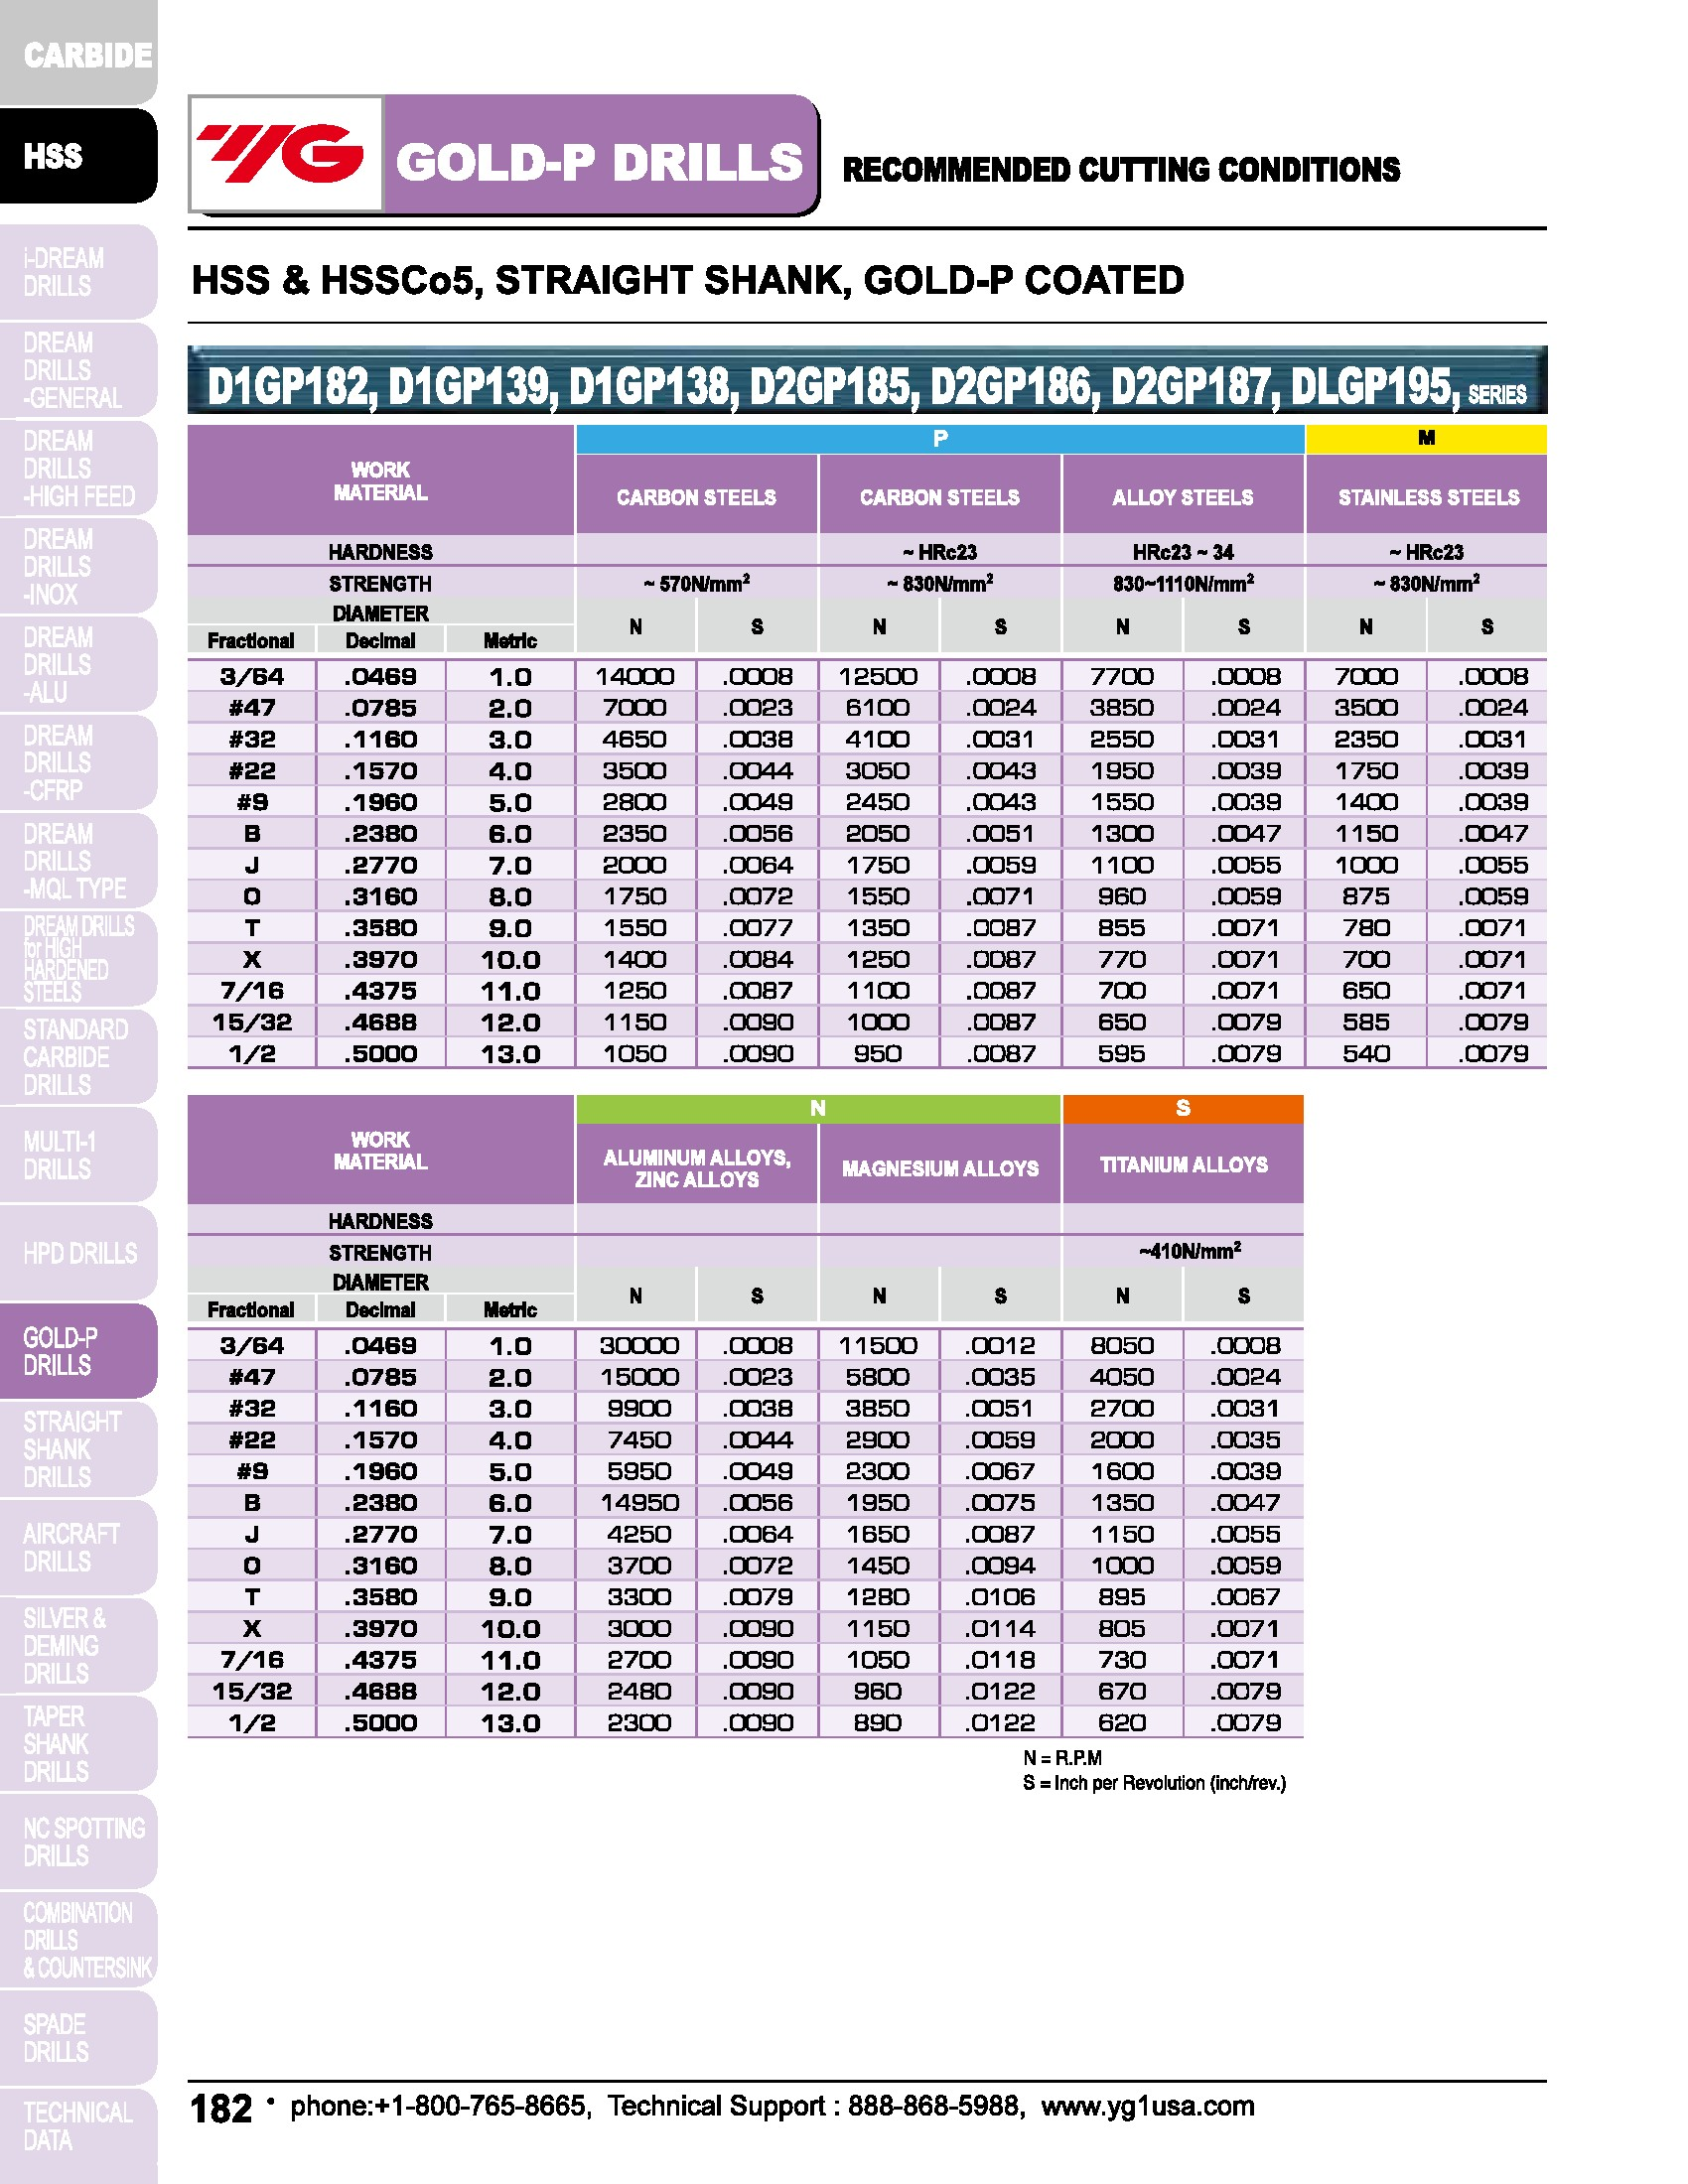 M35 5pcs 1.0mm HSS-Co5/% Jobber Length Straight Shank TiN Gold-P Drills YG1